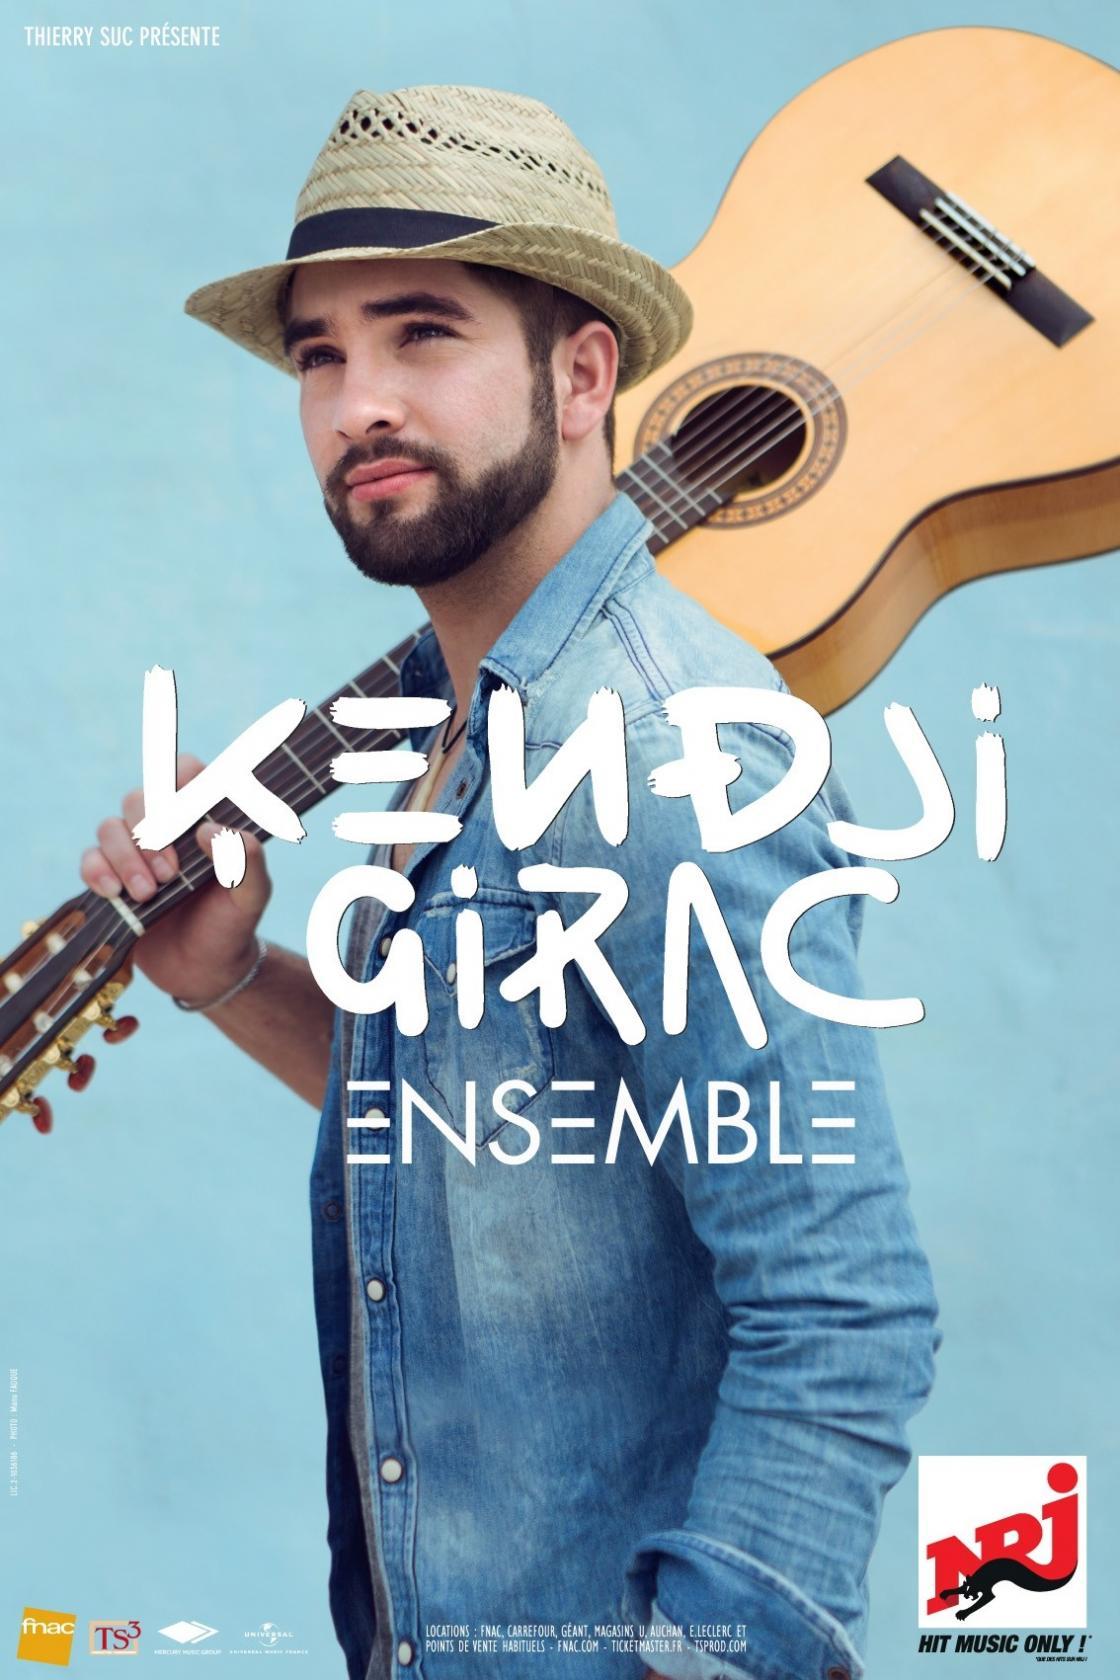 Kendji Girac Saint-Herblain